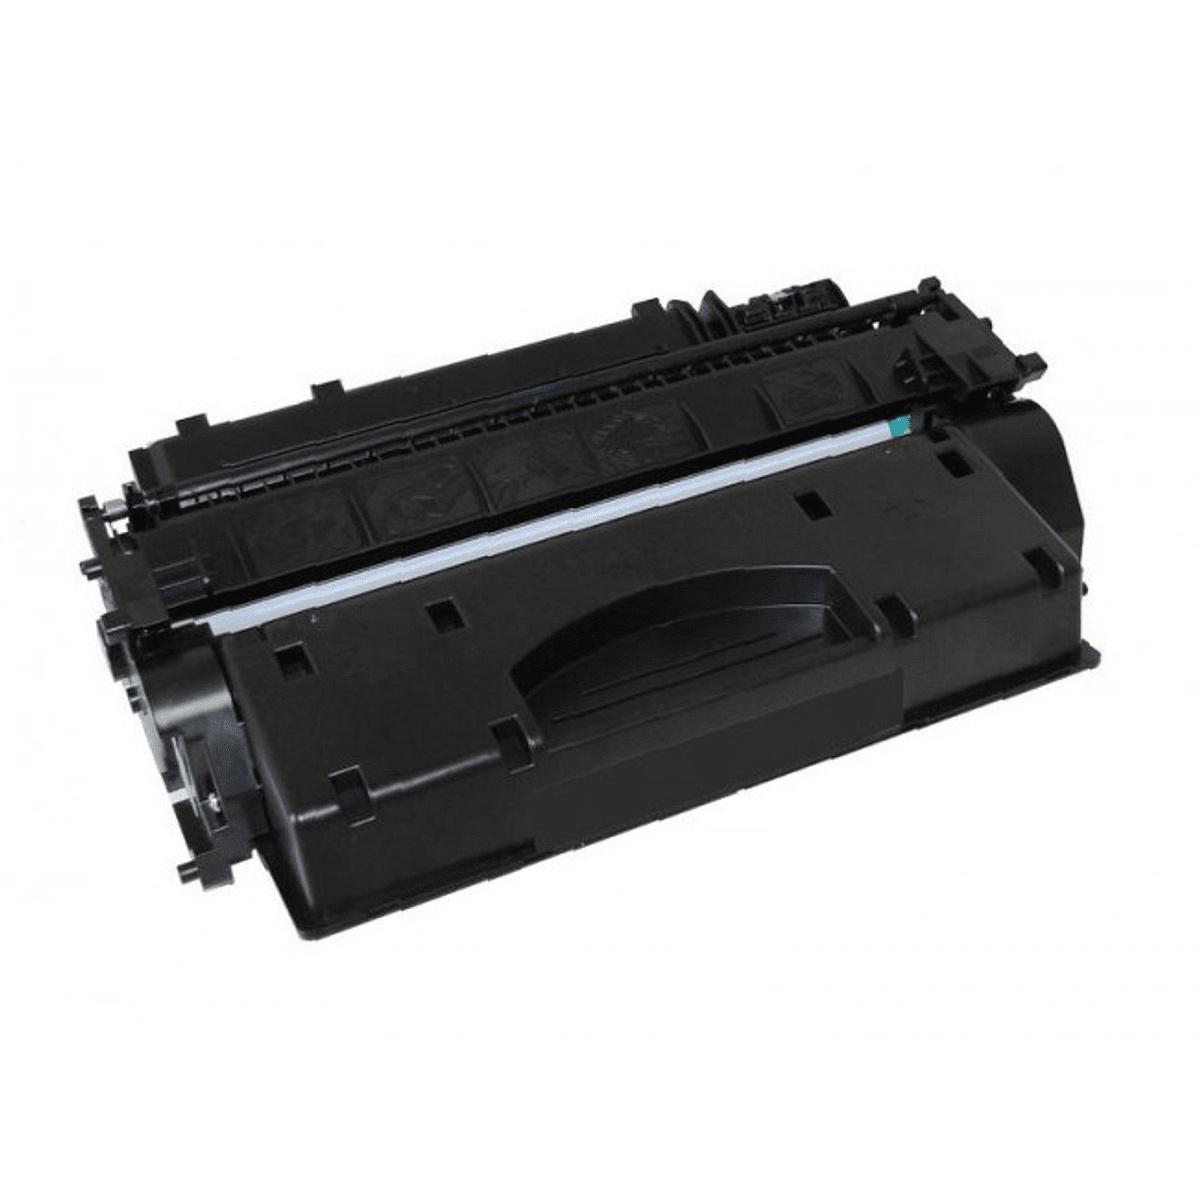 Картридж лазерный MAK №80X/№05X CF280X/CE505X черный (black), до 6900 стр. цена и фото